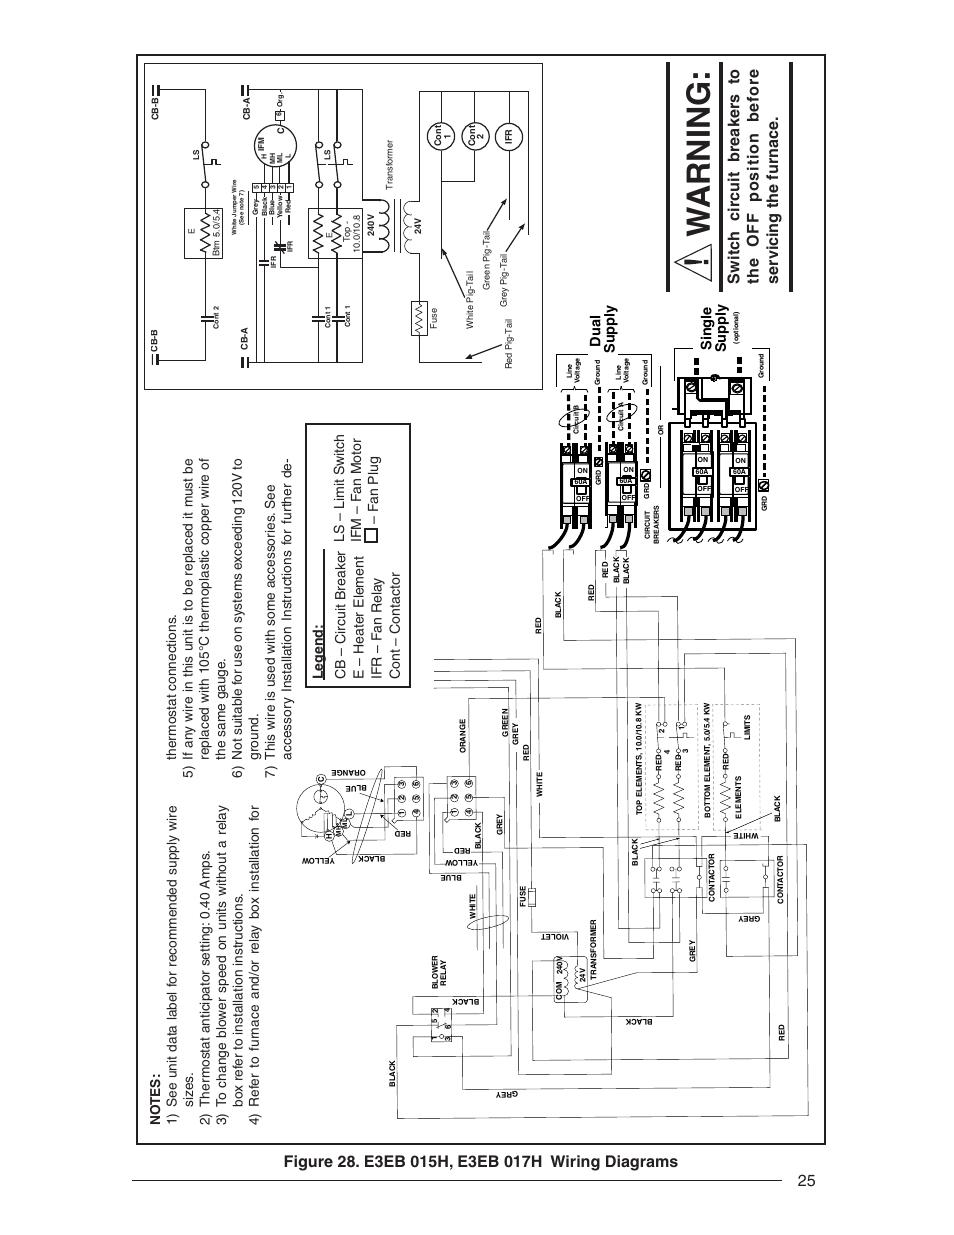 Wiring Diagram For Nordyne Model  S3ba